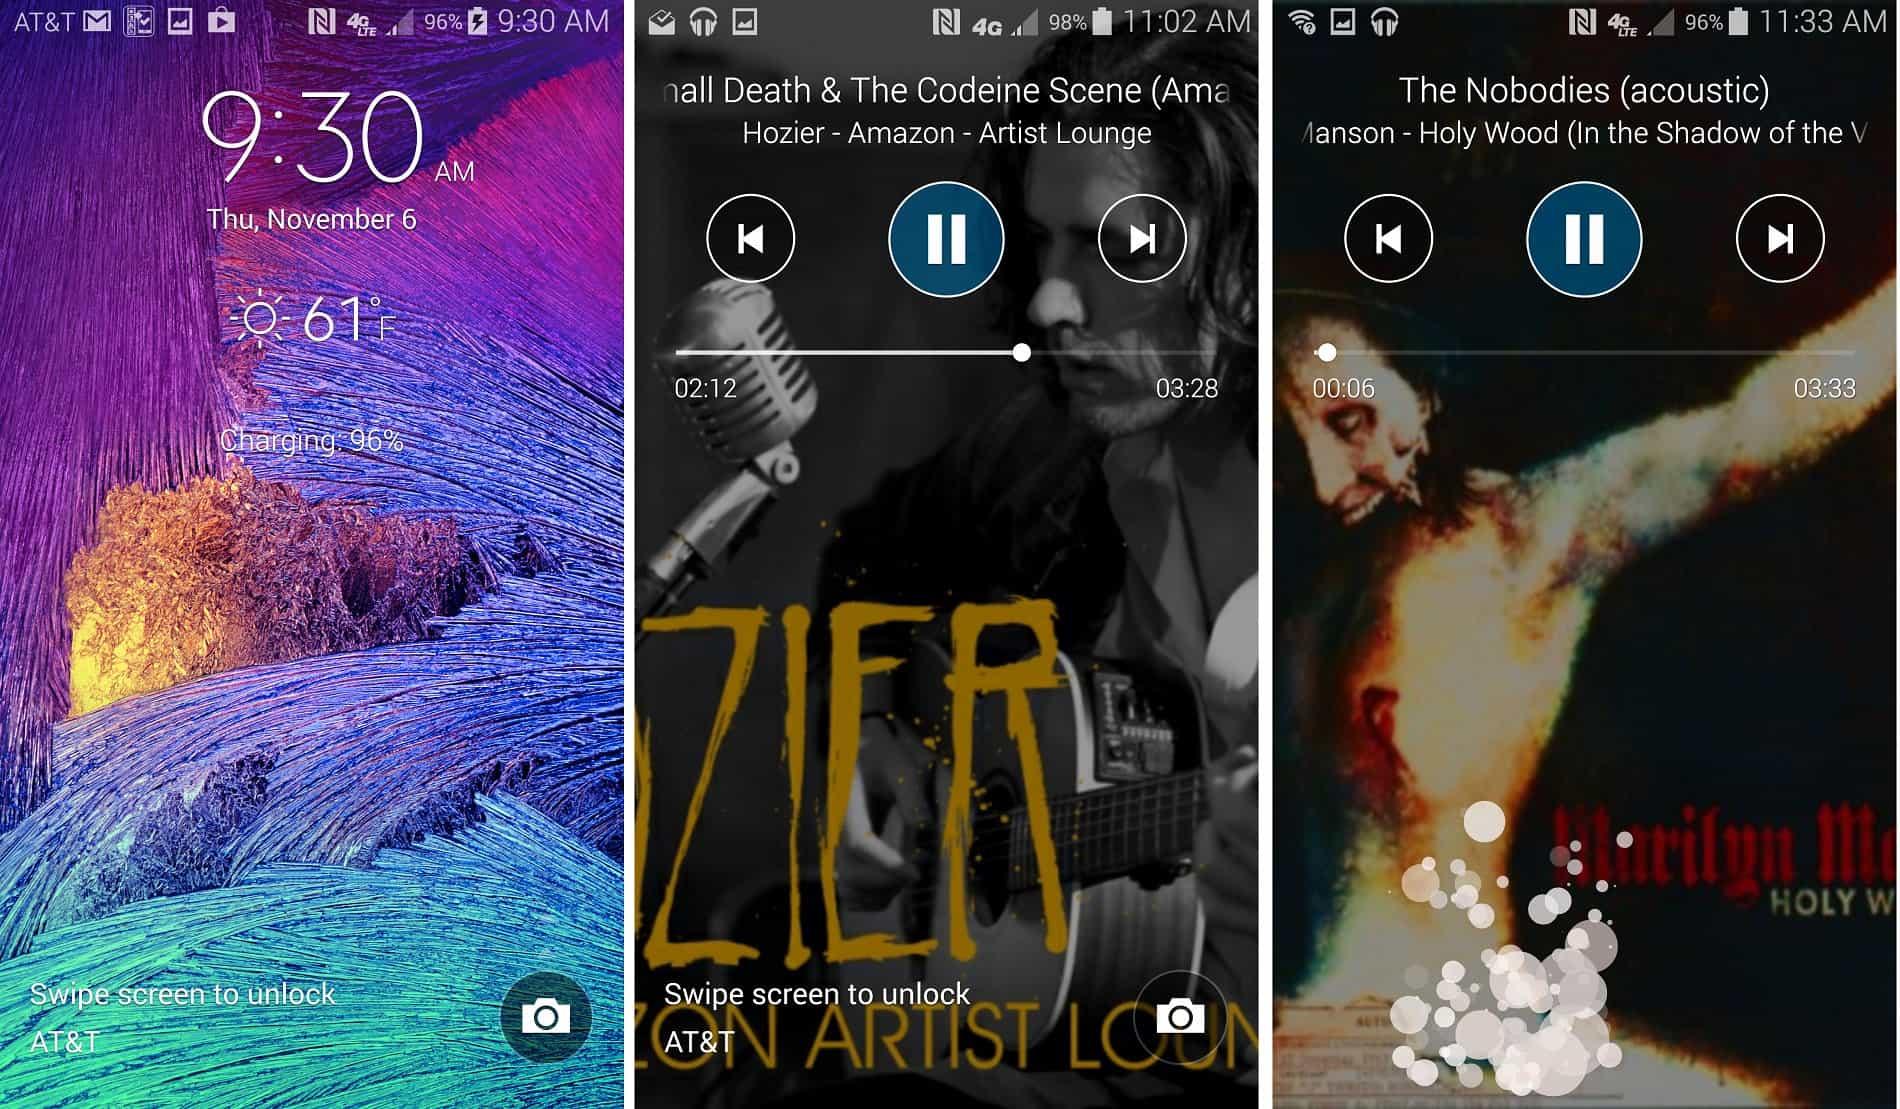 Samsung Note 4 Screenshots-7